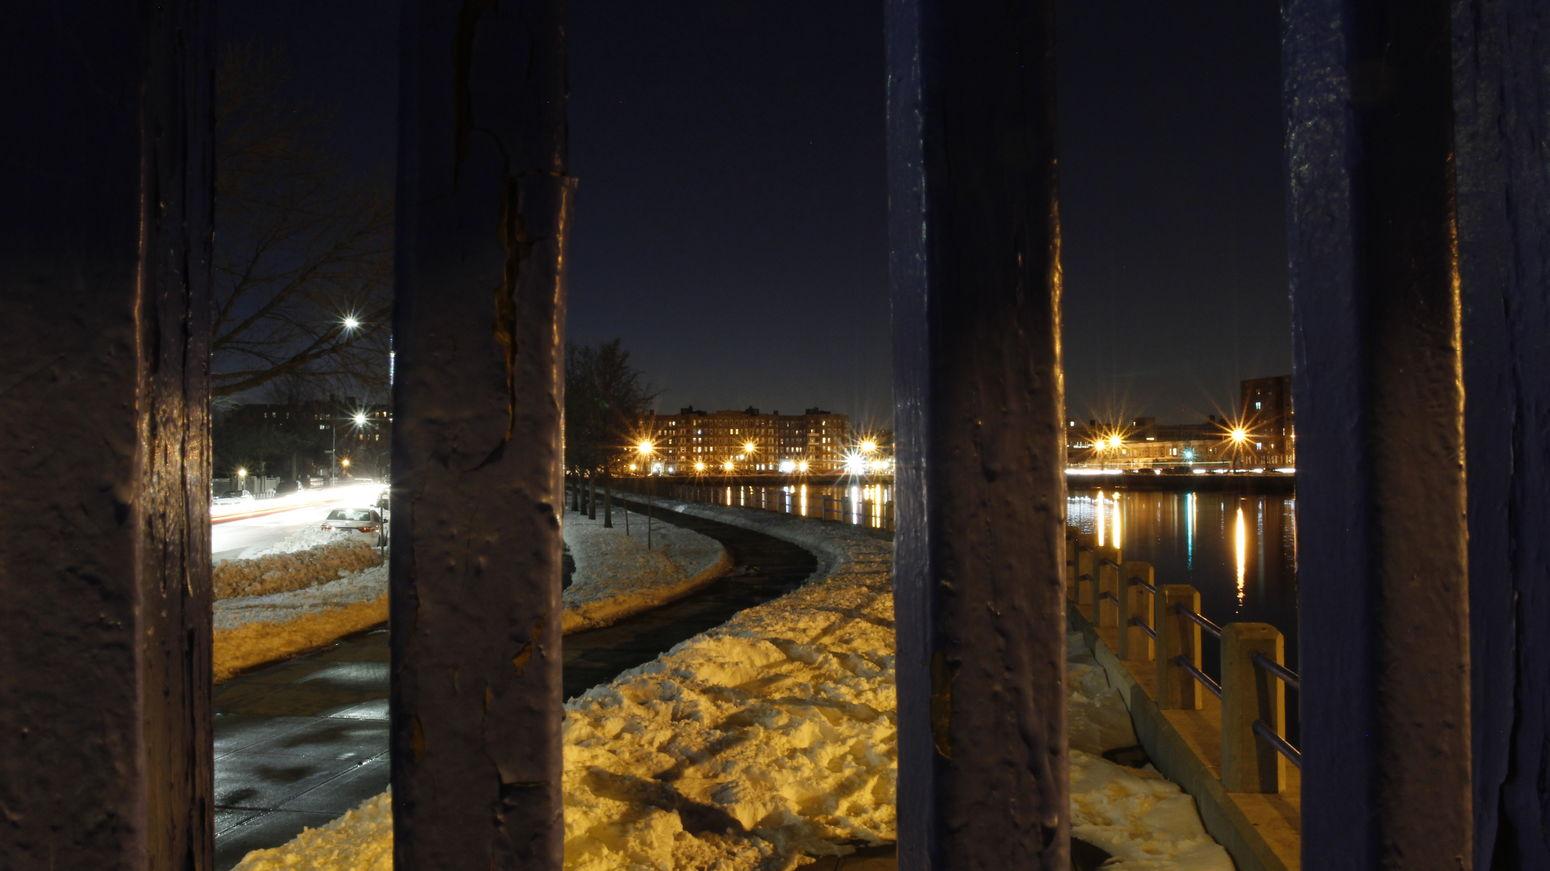 Sheepshead bay Sheepshead Bay NYC Photography Badideaphotography Photographer Night Long Exposure Lights Snow ❄ Jonas NYC